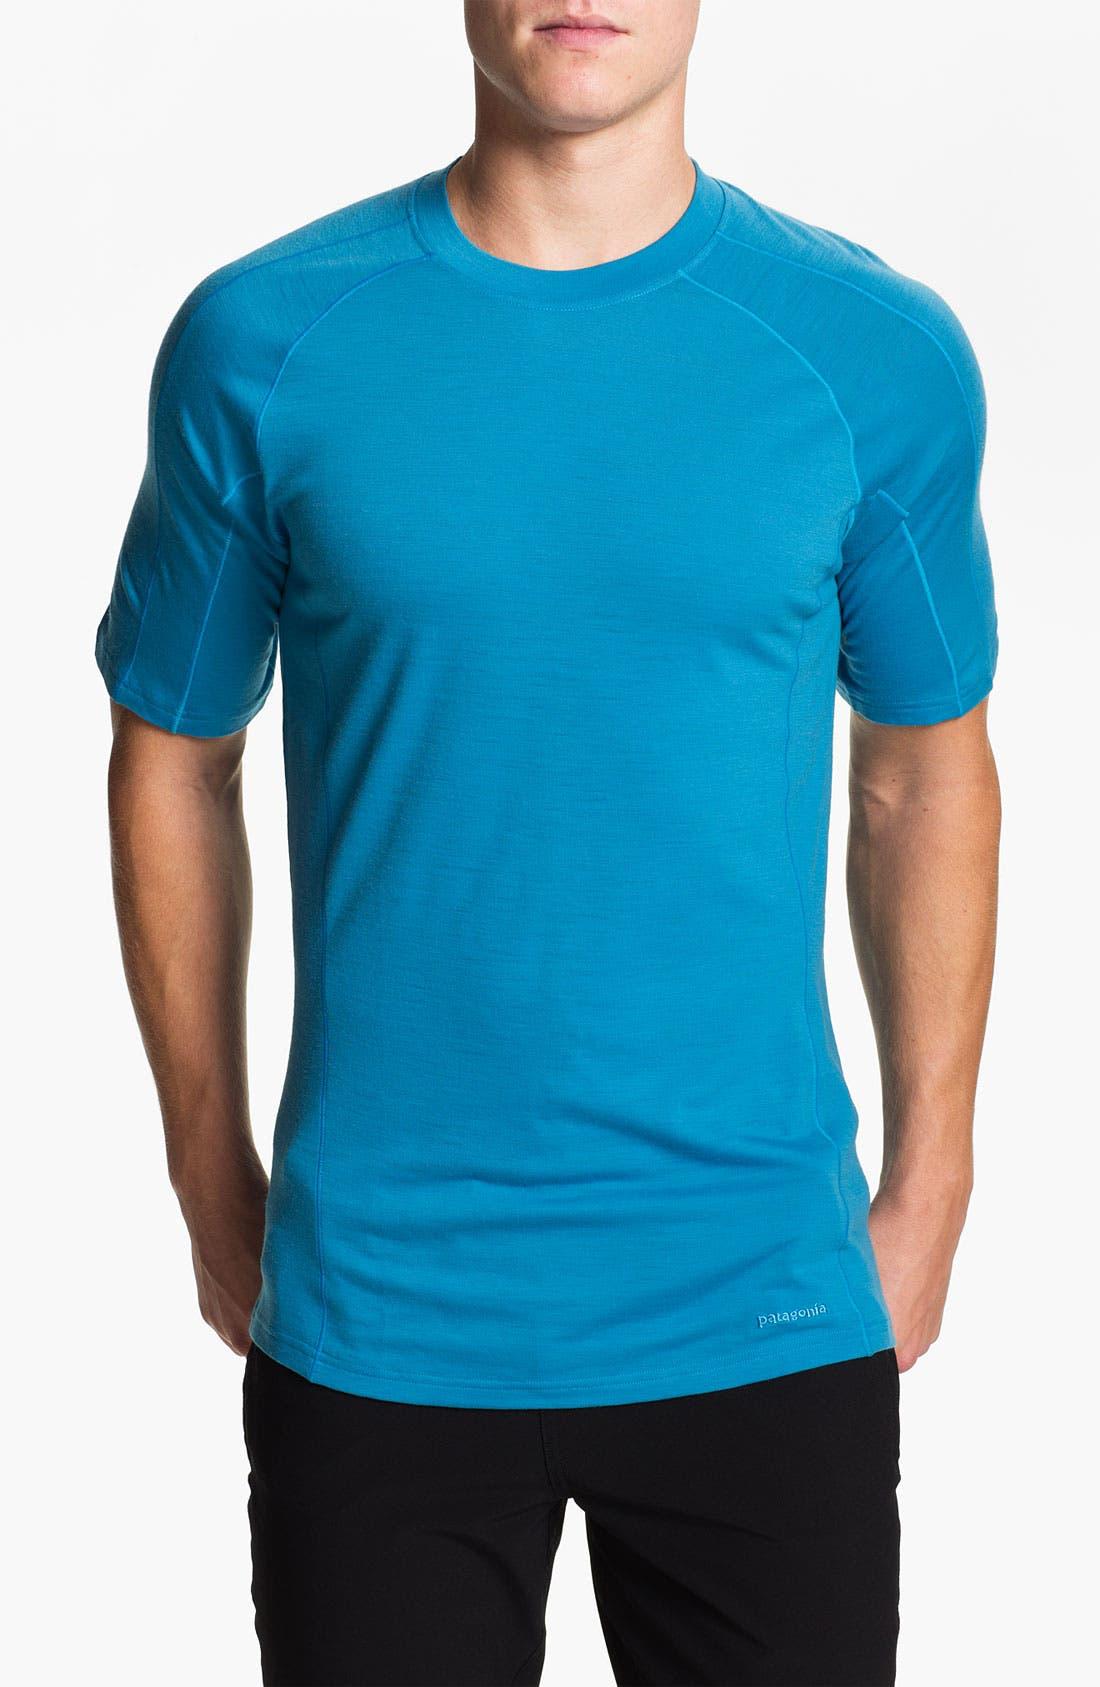 Main Image - Patagonia 'Merino 2' T-Shirt